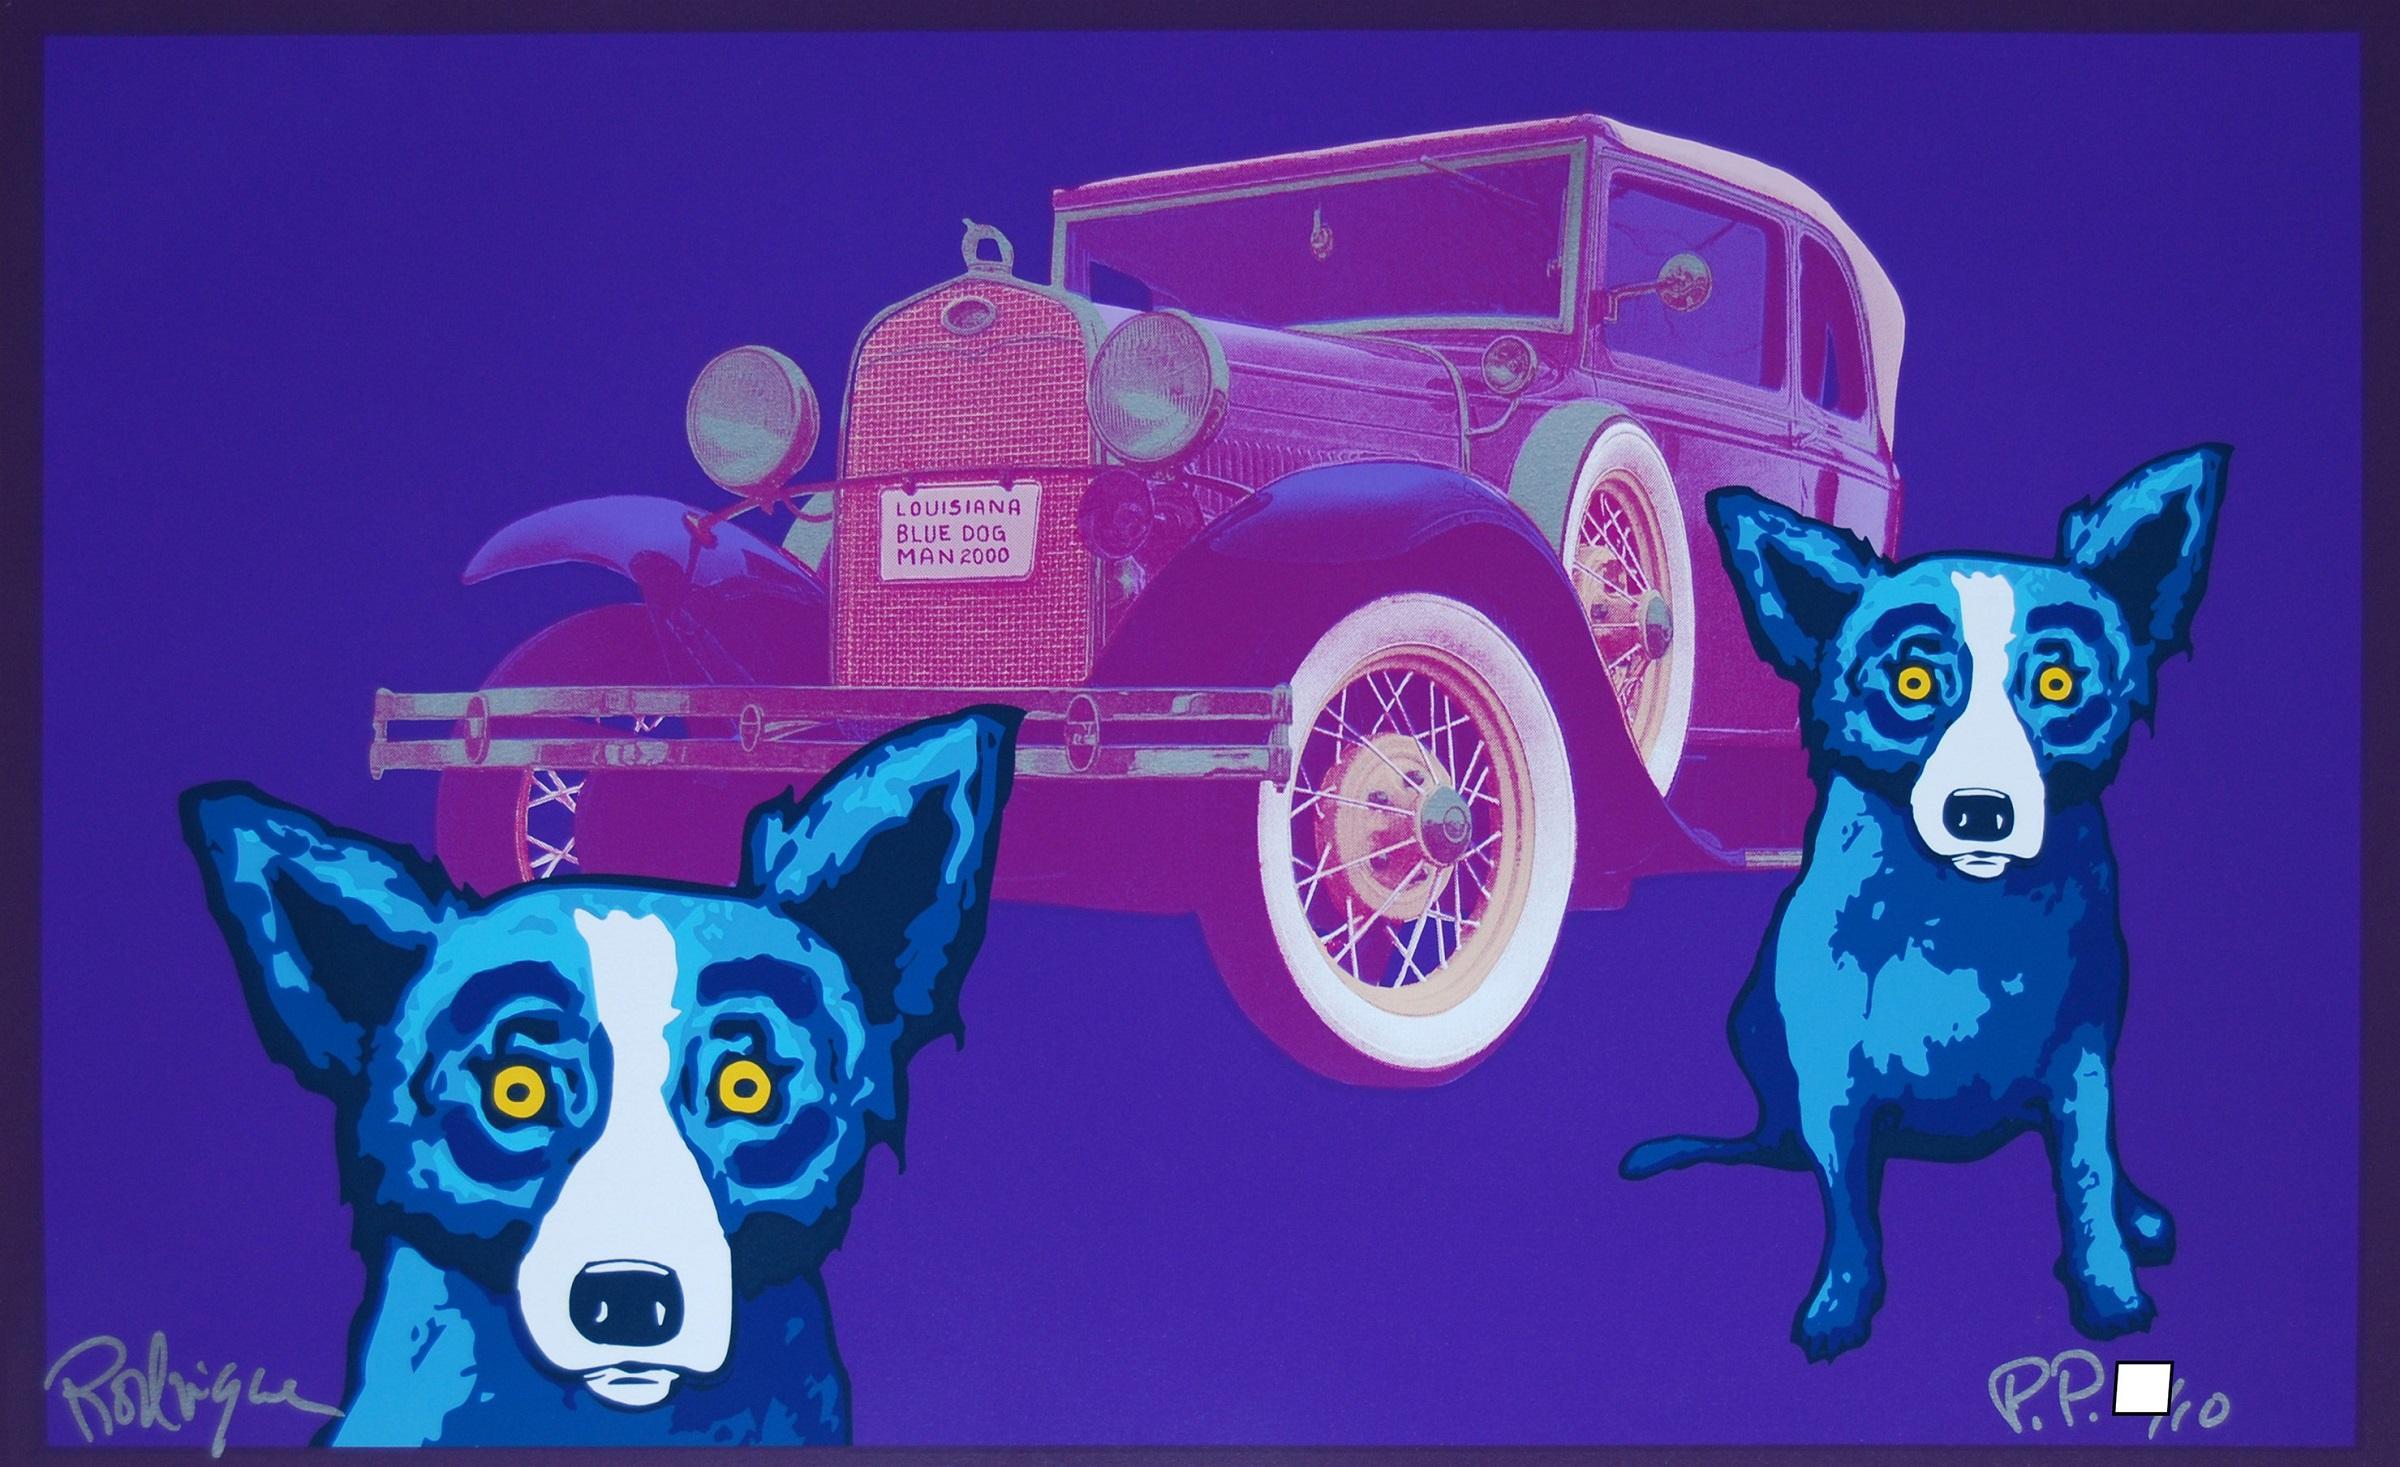 Louisiana Blue Dog Man - Signed Silkscreen Blue Dog Print